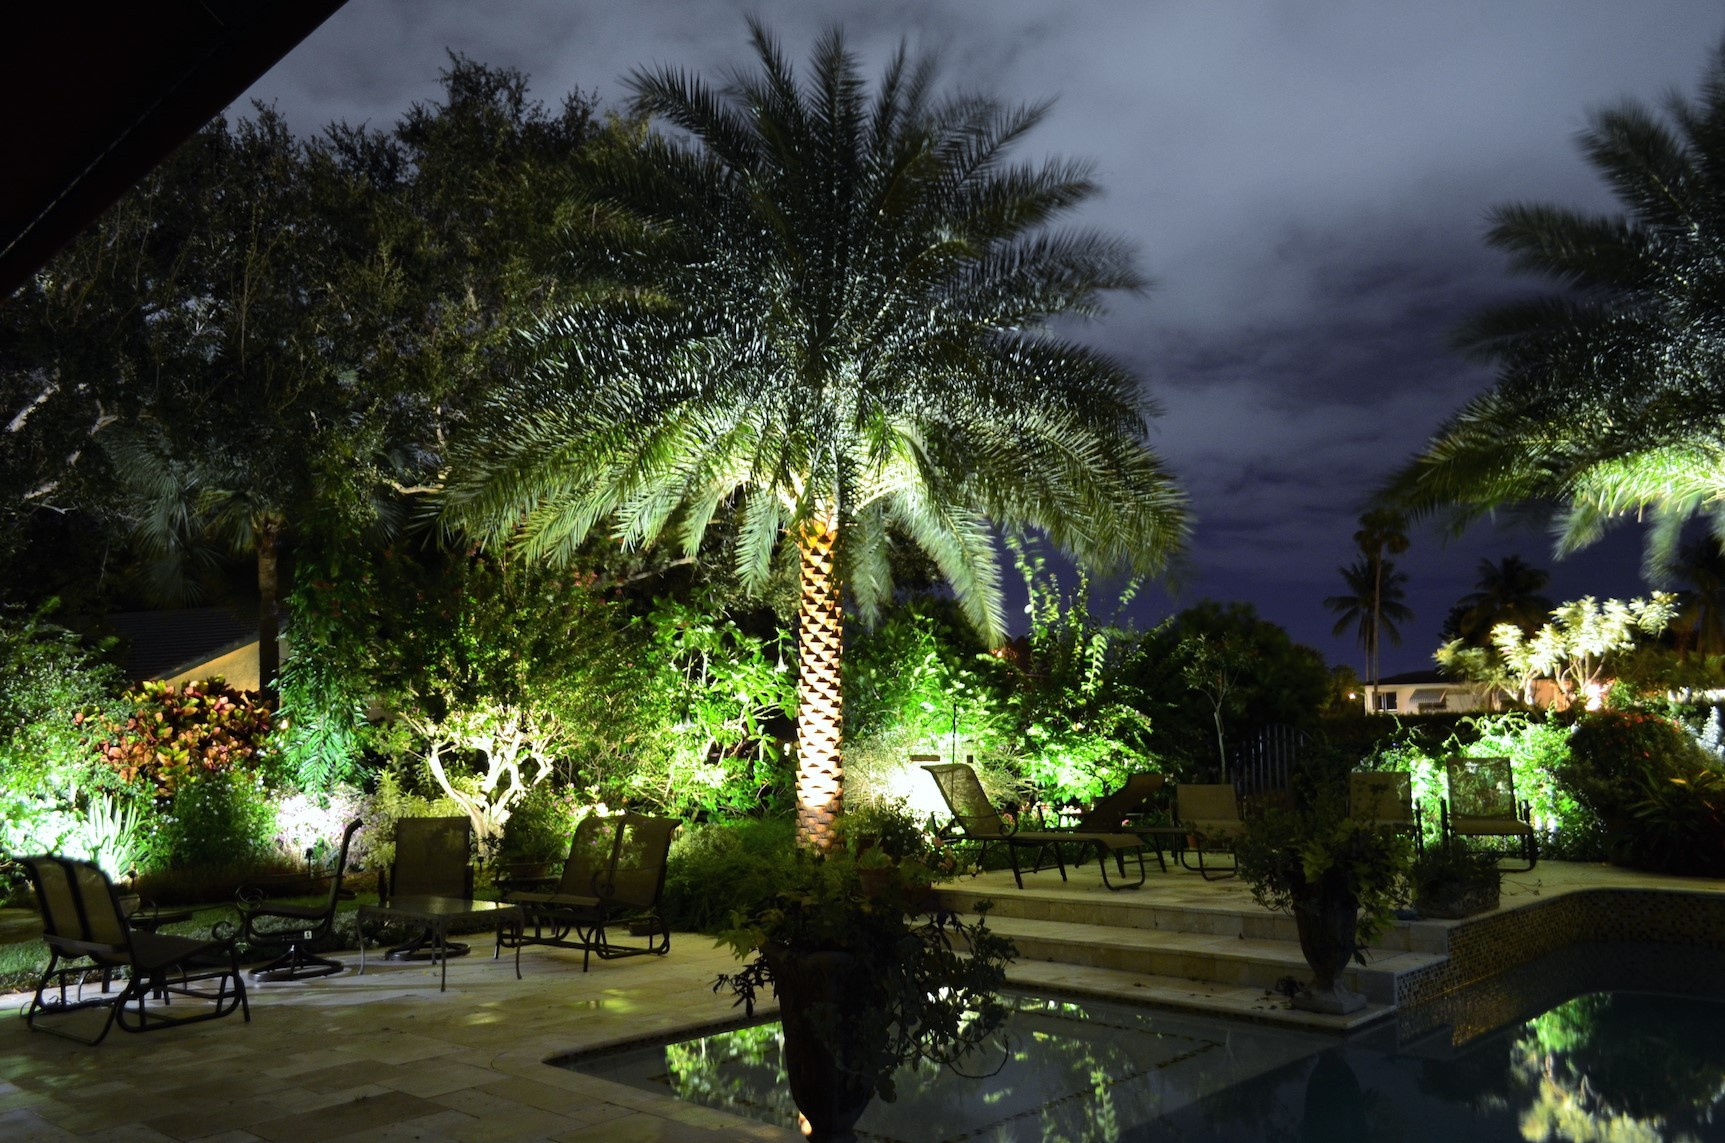 landscape lighting installers near